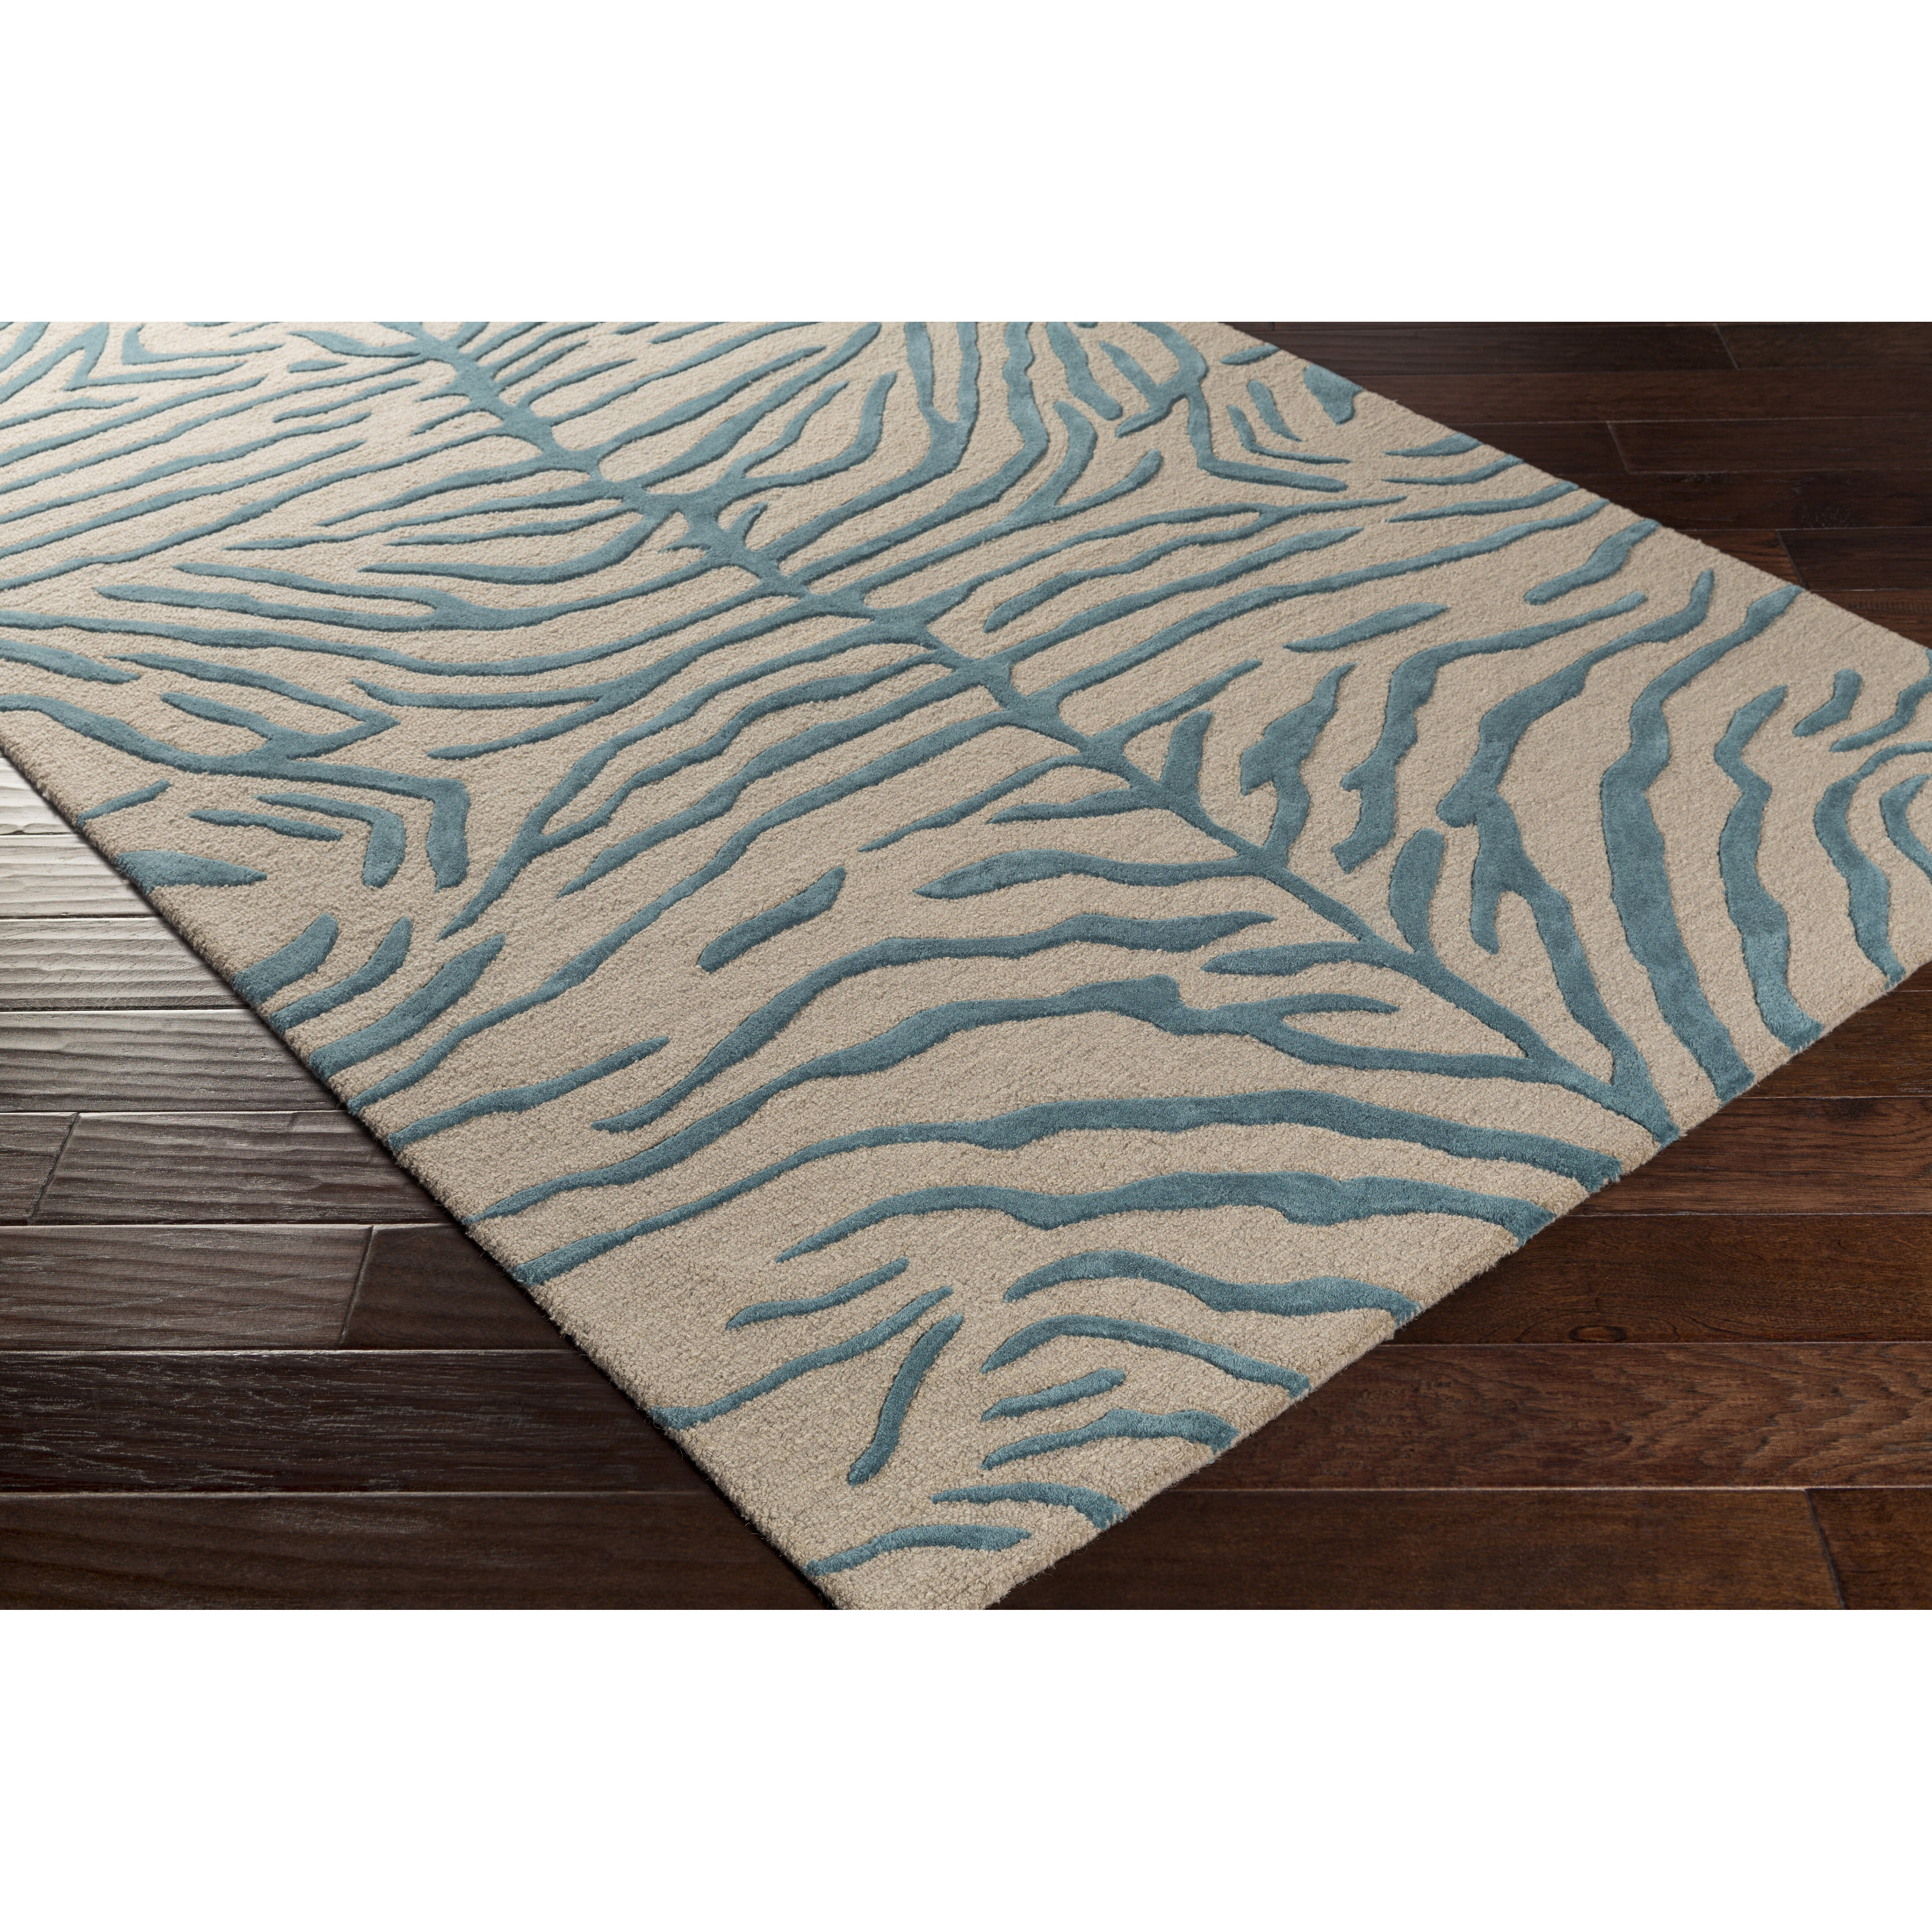 Artistic Weavers Pollack Hannah Handmade Teal/Beige Area